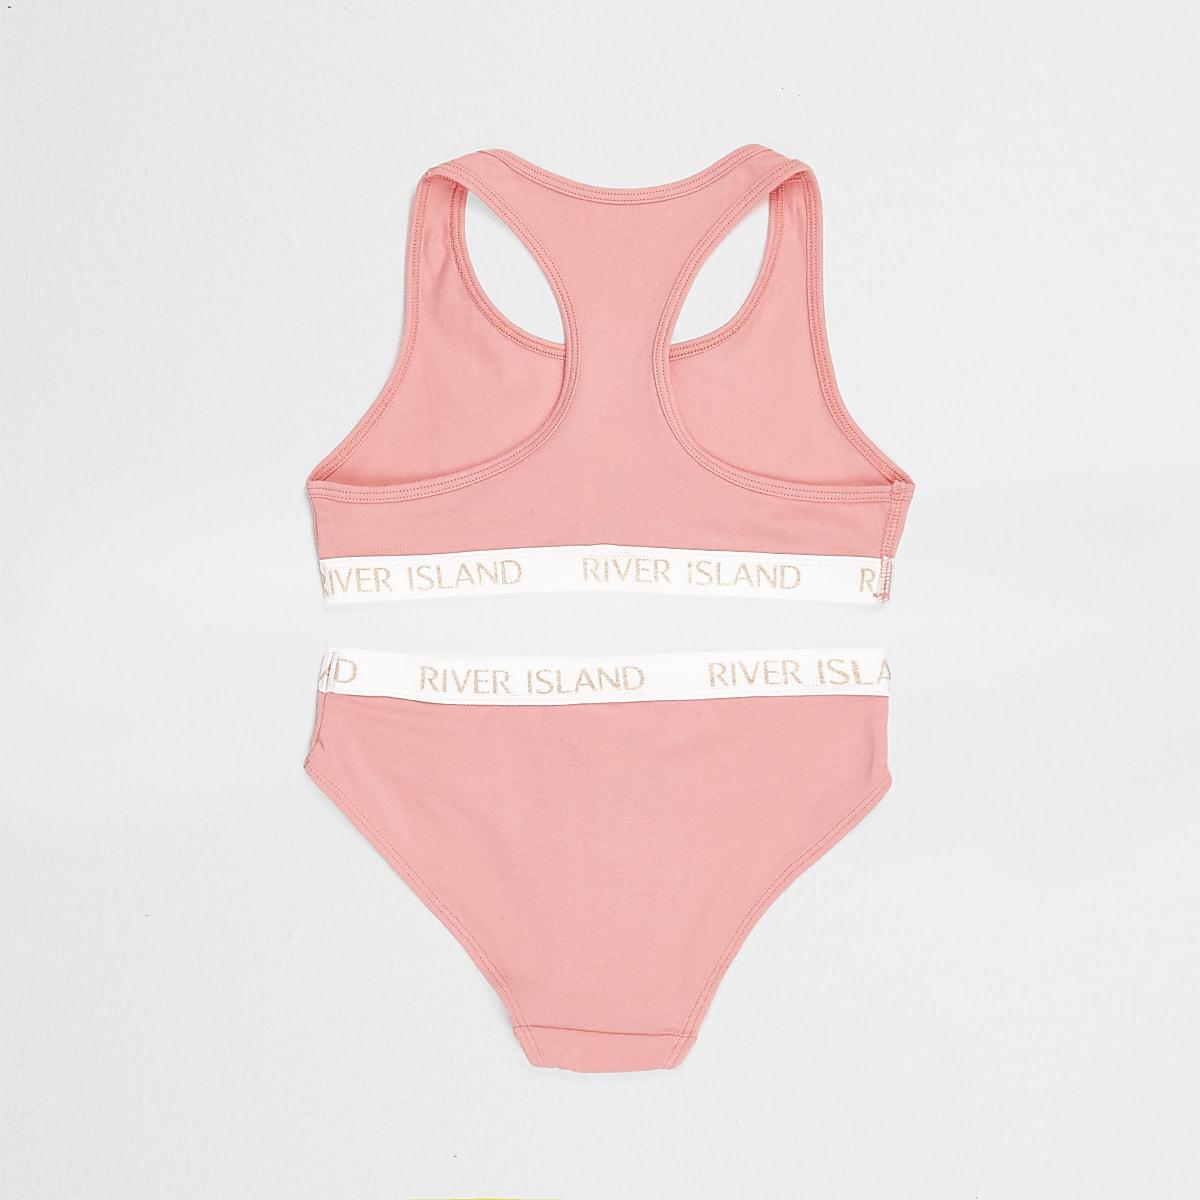 c8e6d13d0f0f Girls pink branded crop top and briefs set - Pyjamas & Underwear - girls